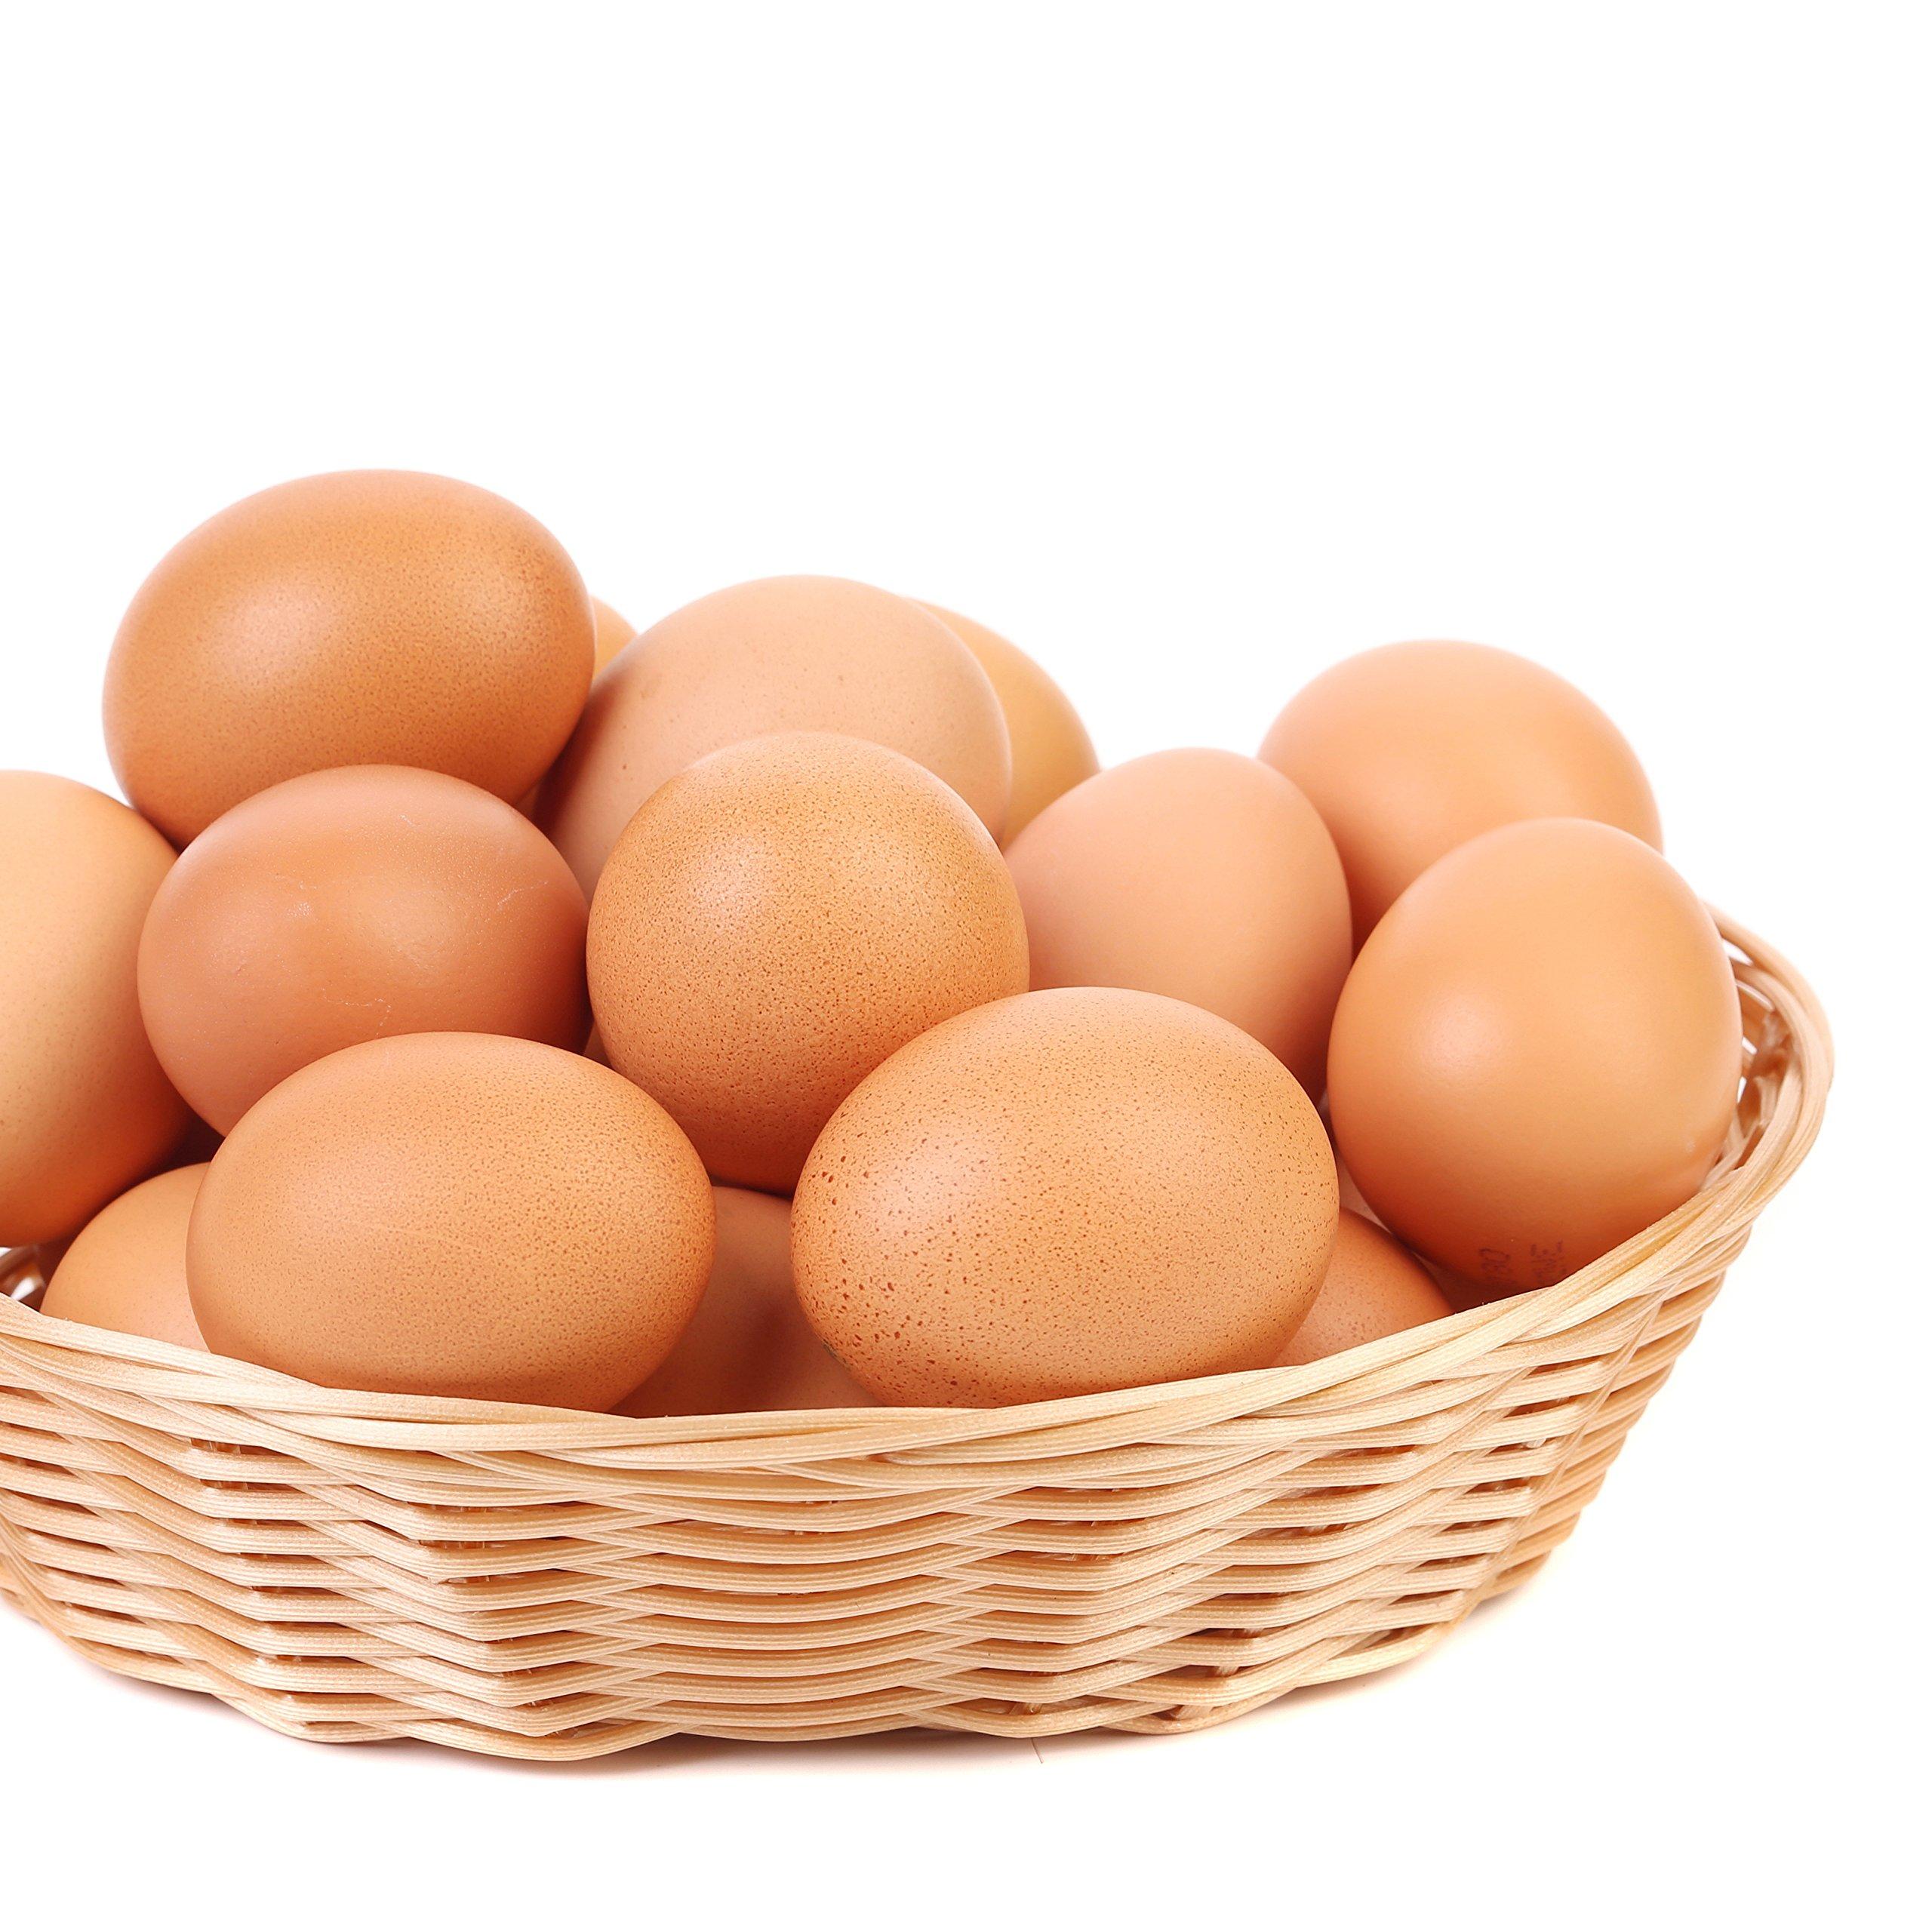 Augason Farms Dried Whole Egg Product 2 lbs 1 oz No. 10 Can by Augason Farms (Image #7)